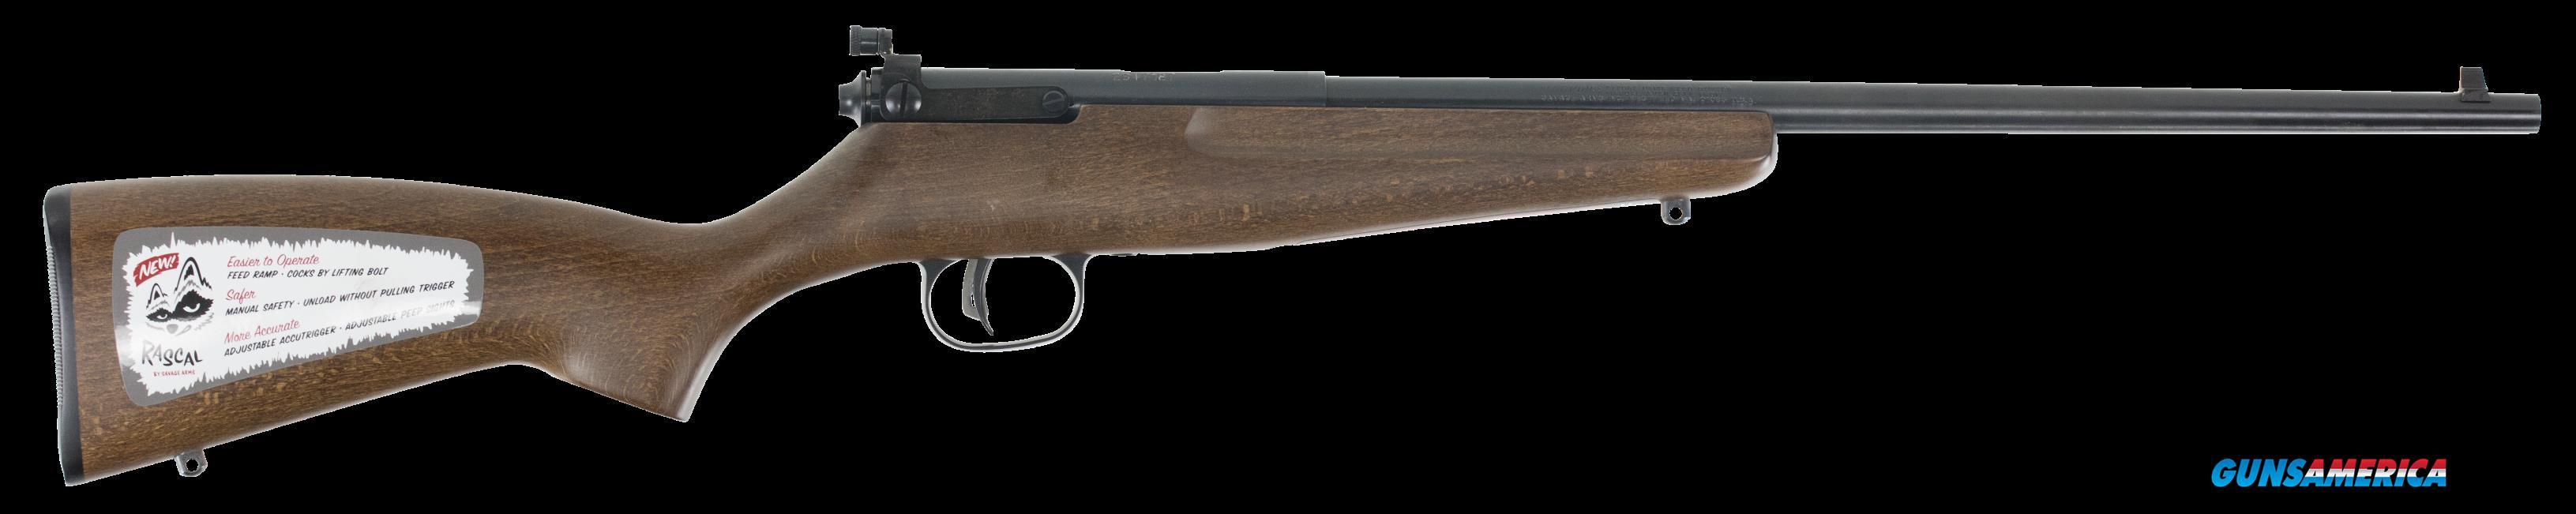 Savage Rascal, Sav 13820 Rascal     22lr Yth Hardwood Lh  Guns > Pistols > 1911 Pistol Copies (non-Colt)